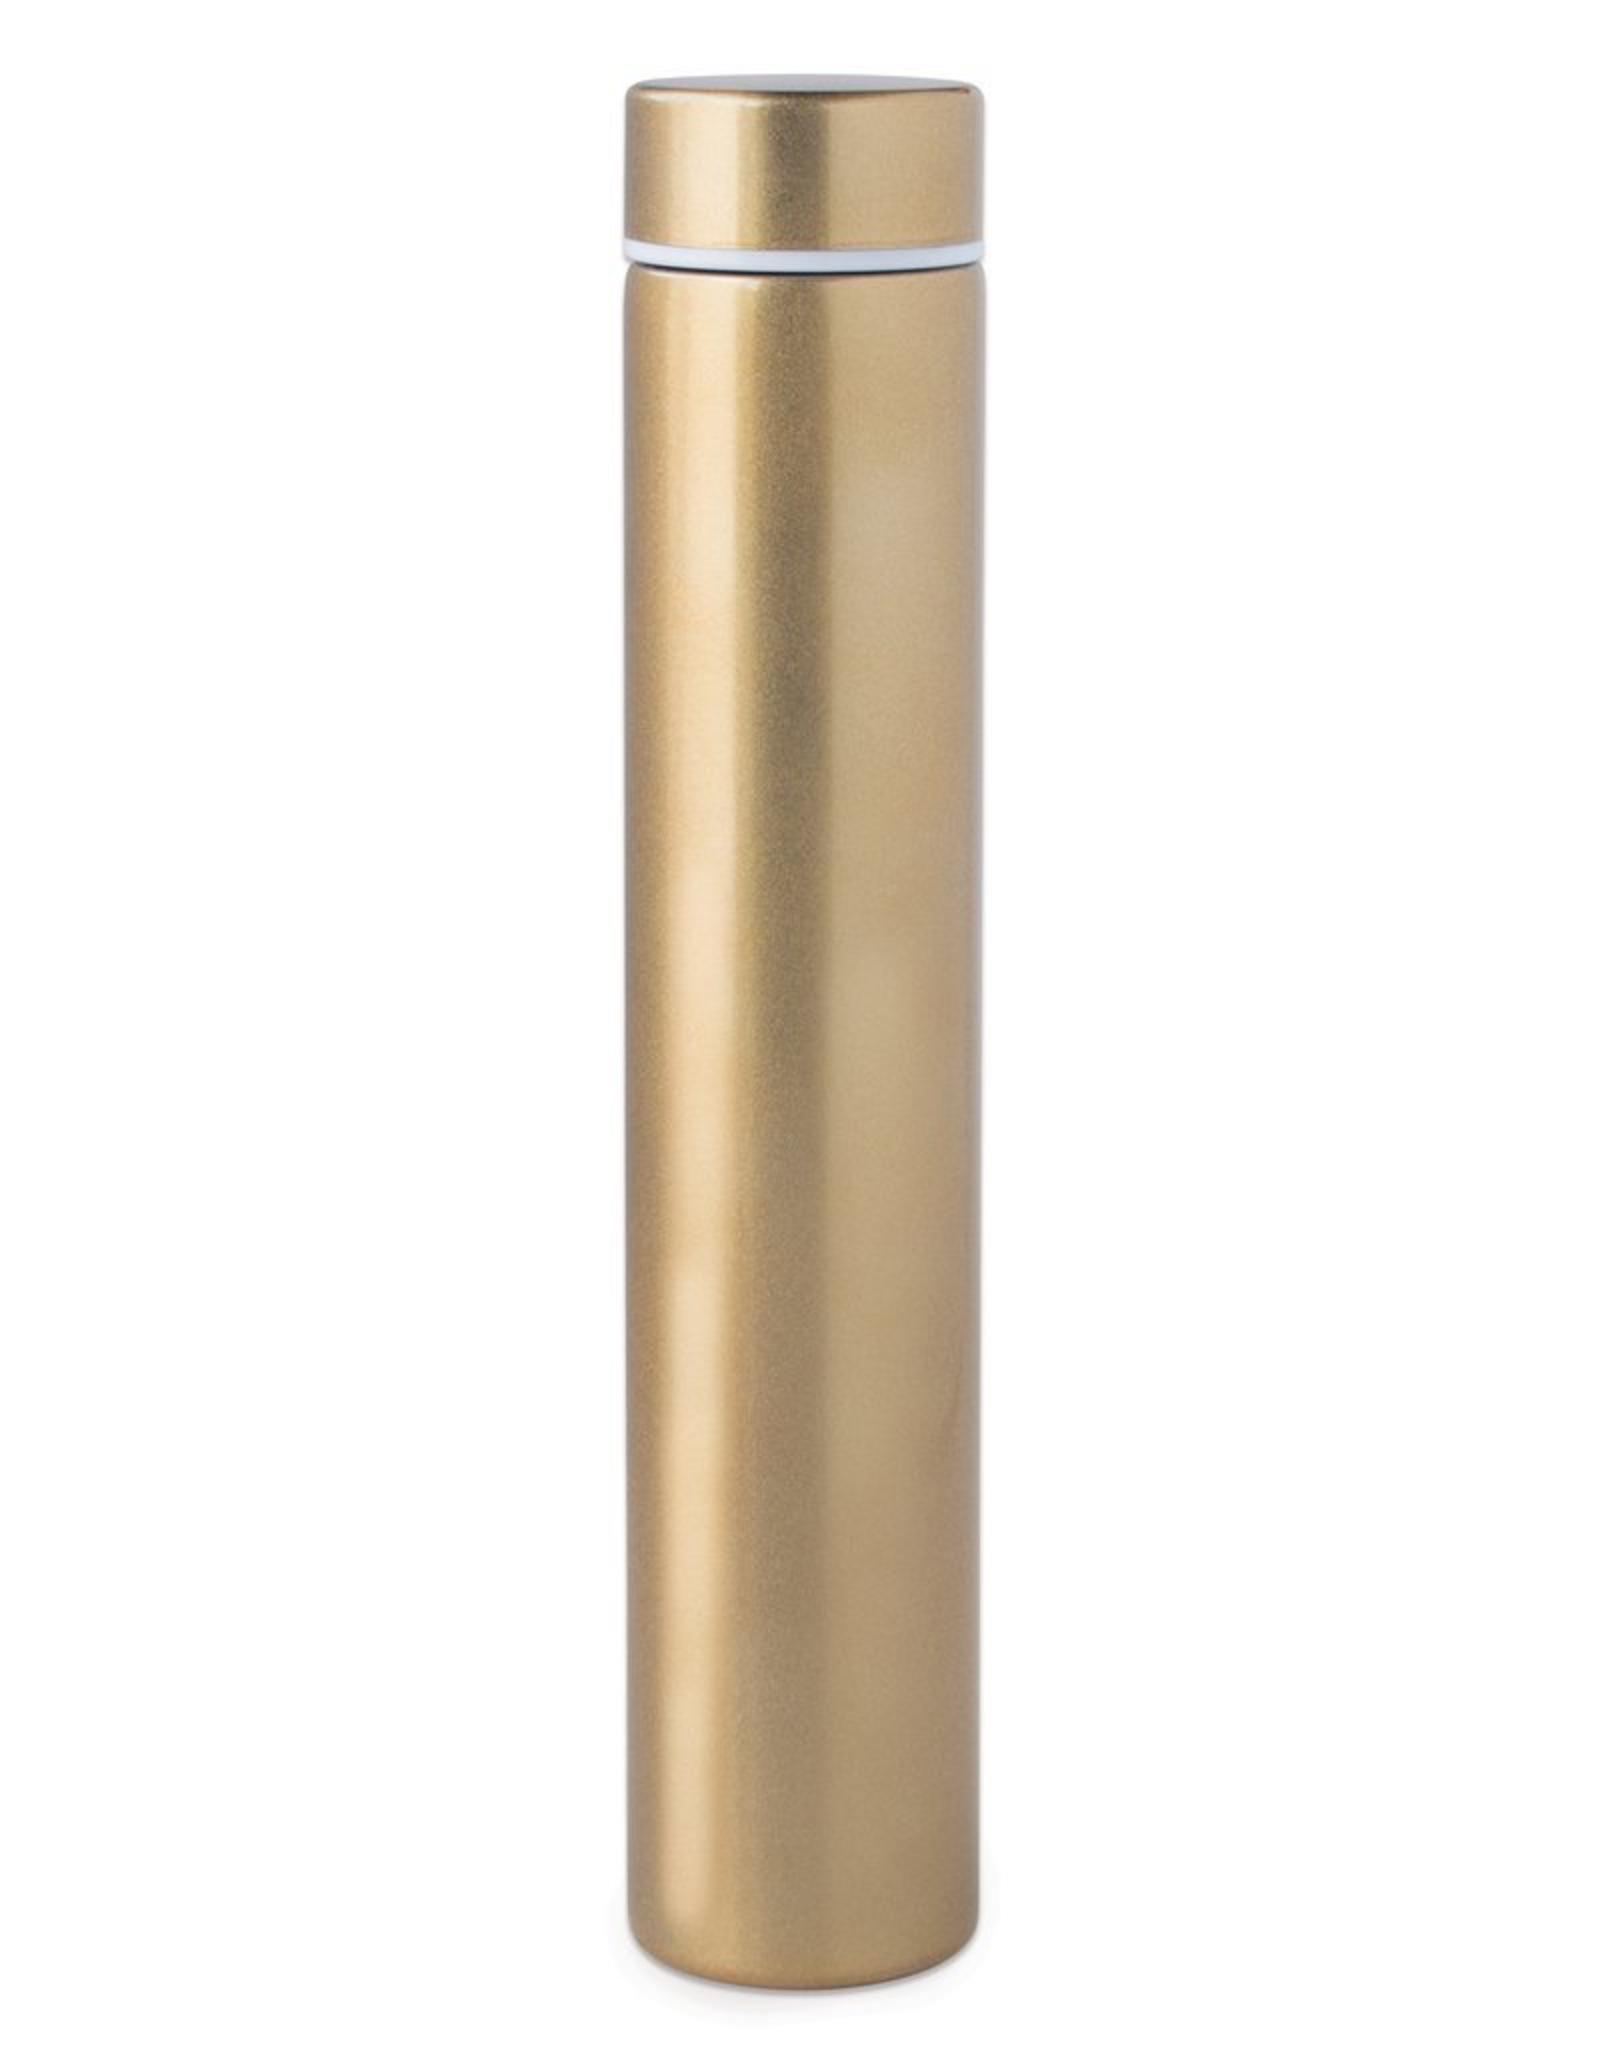 Bottle, Slim Flask in Tube, Gold